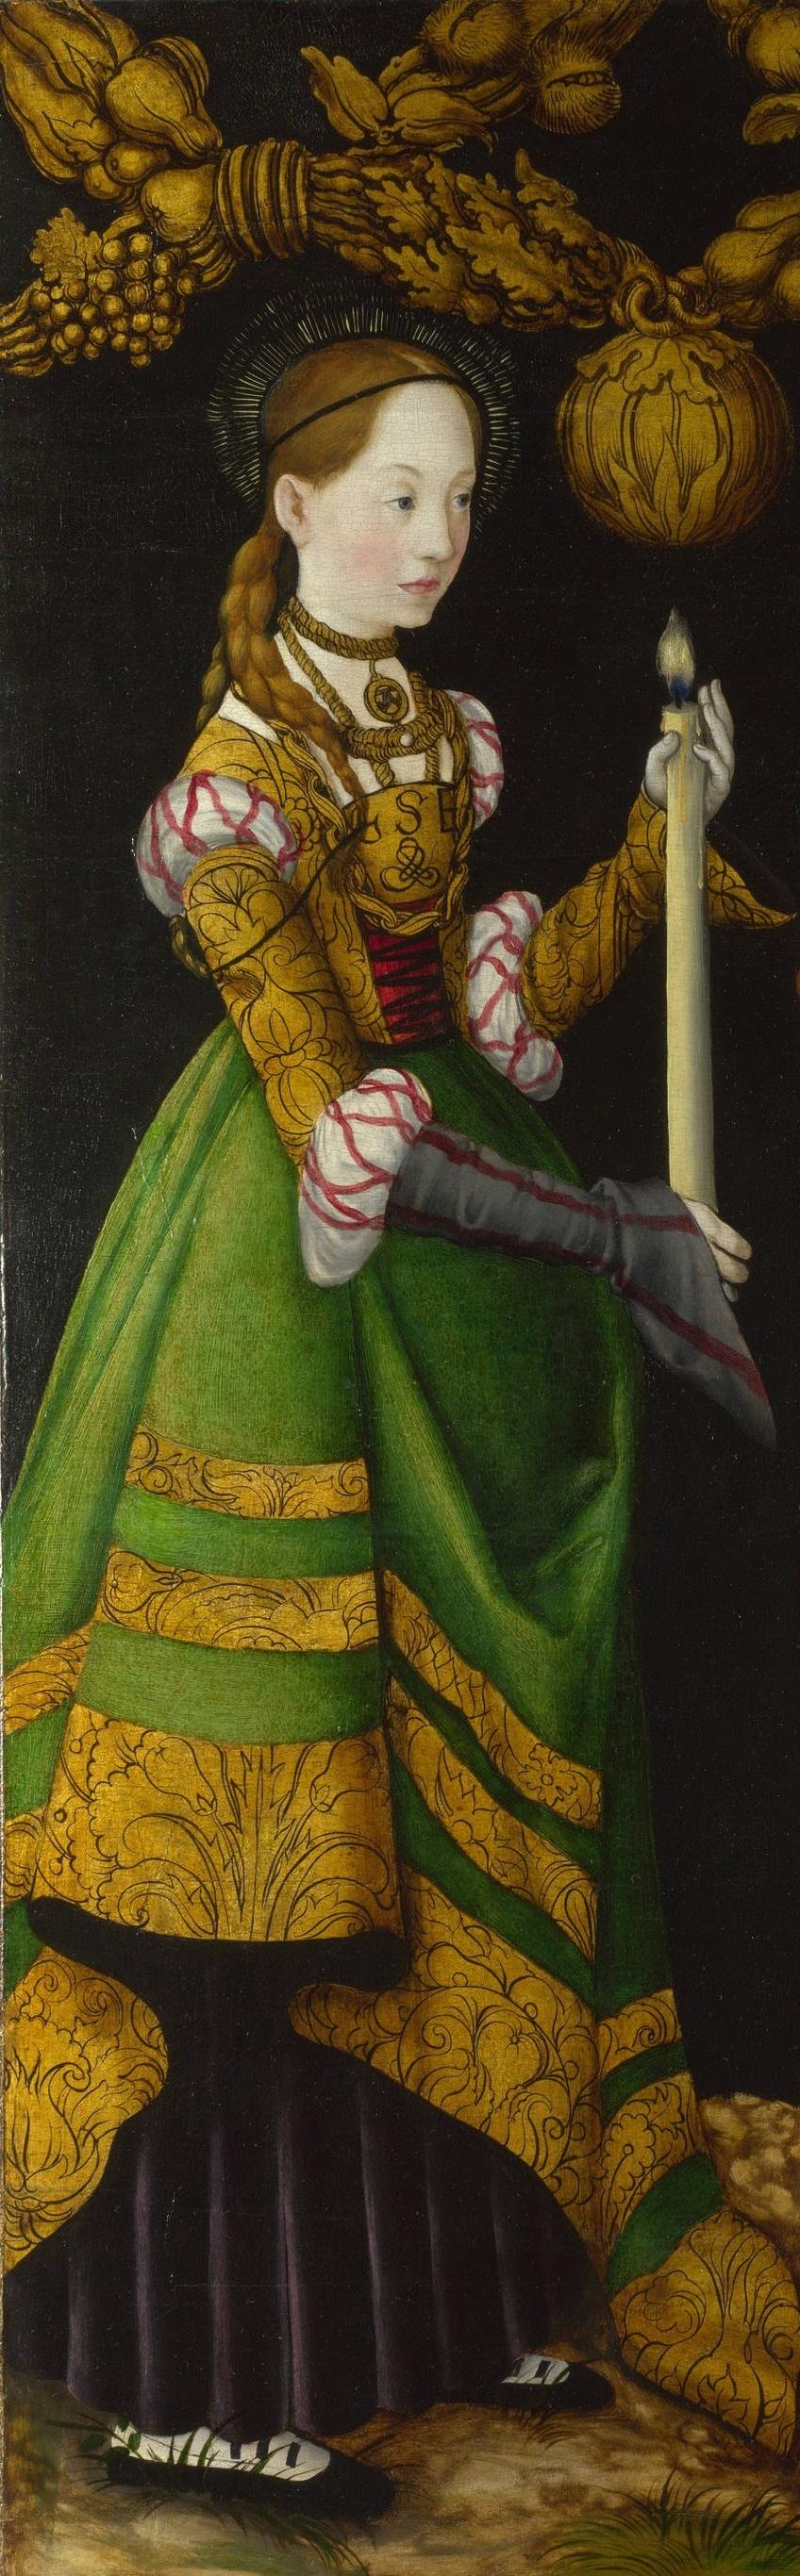 Lucas Cranach d.Ä., Die hl. Genoveva, Katharinenaltar, 1506, Gemäldegalerie Alter Meister, Dresden